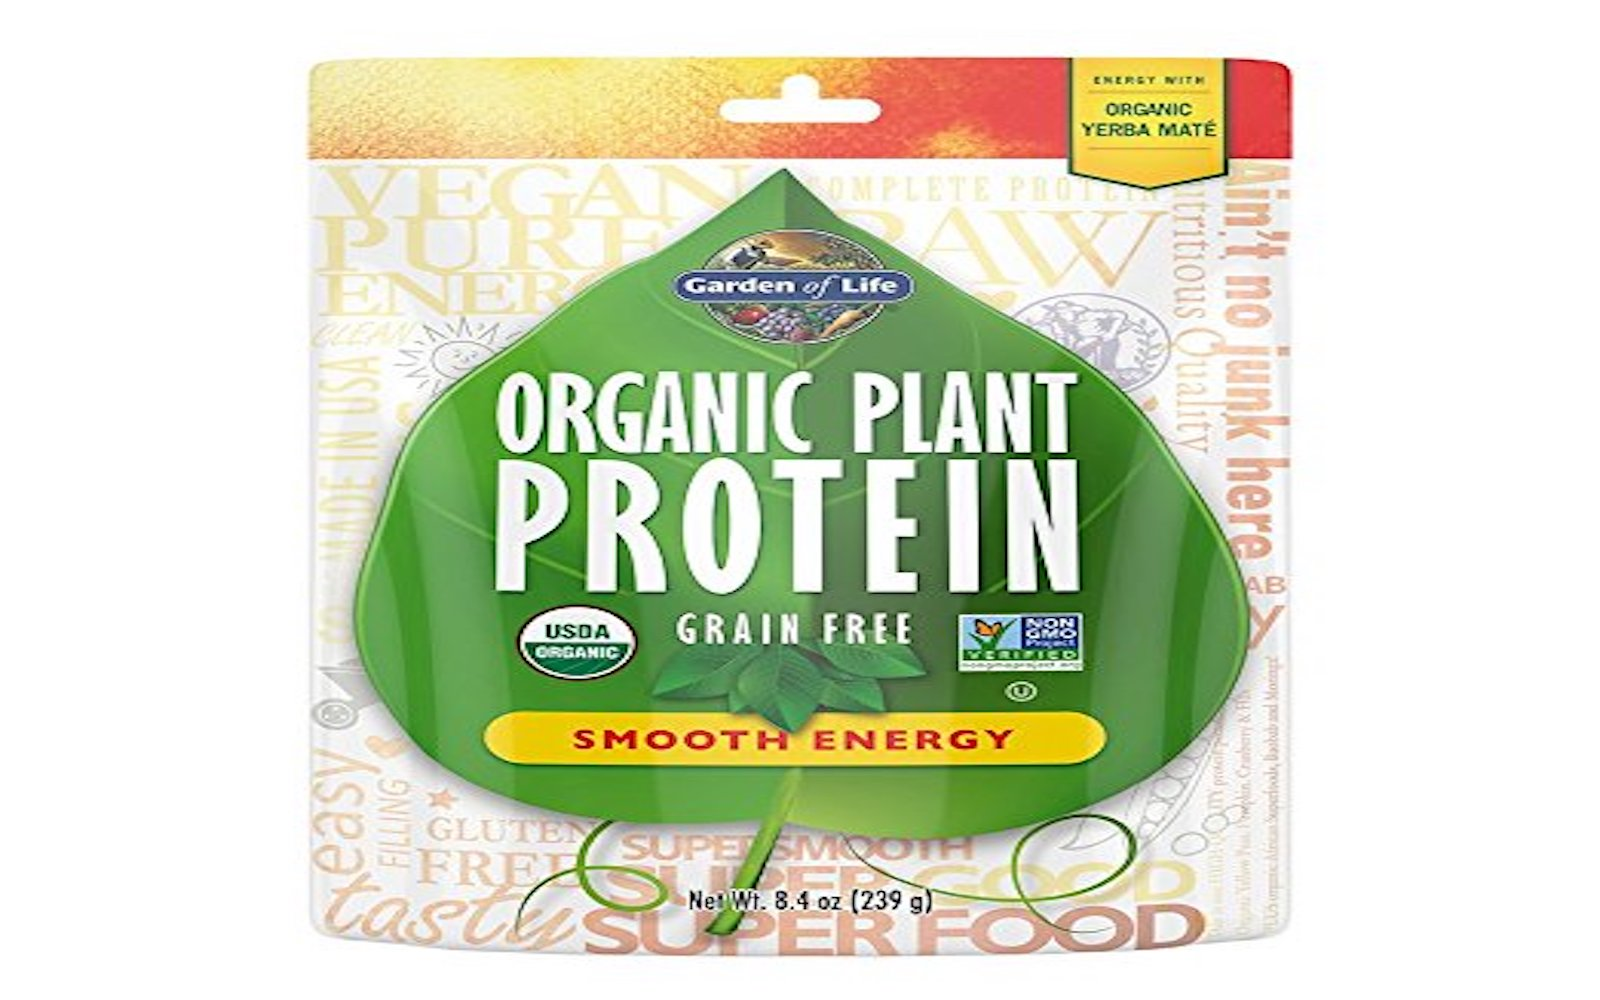 Vegan Plant Based Protein Energy